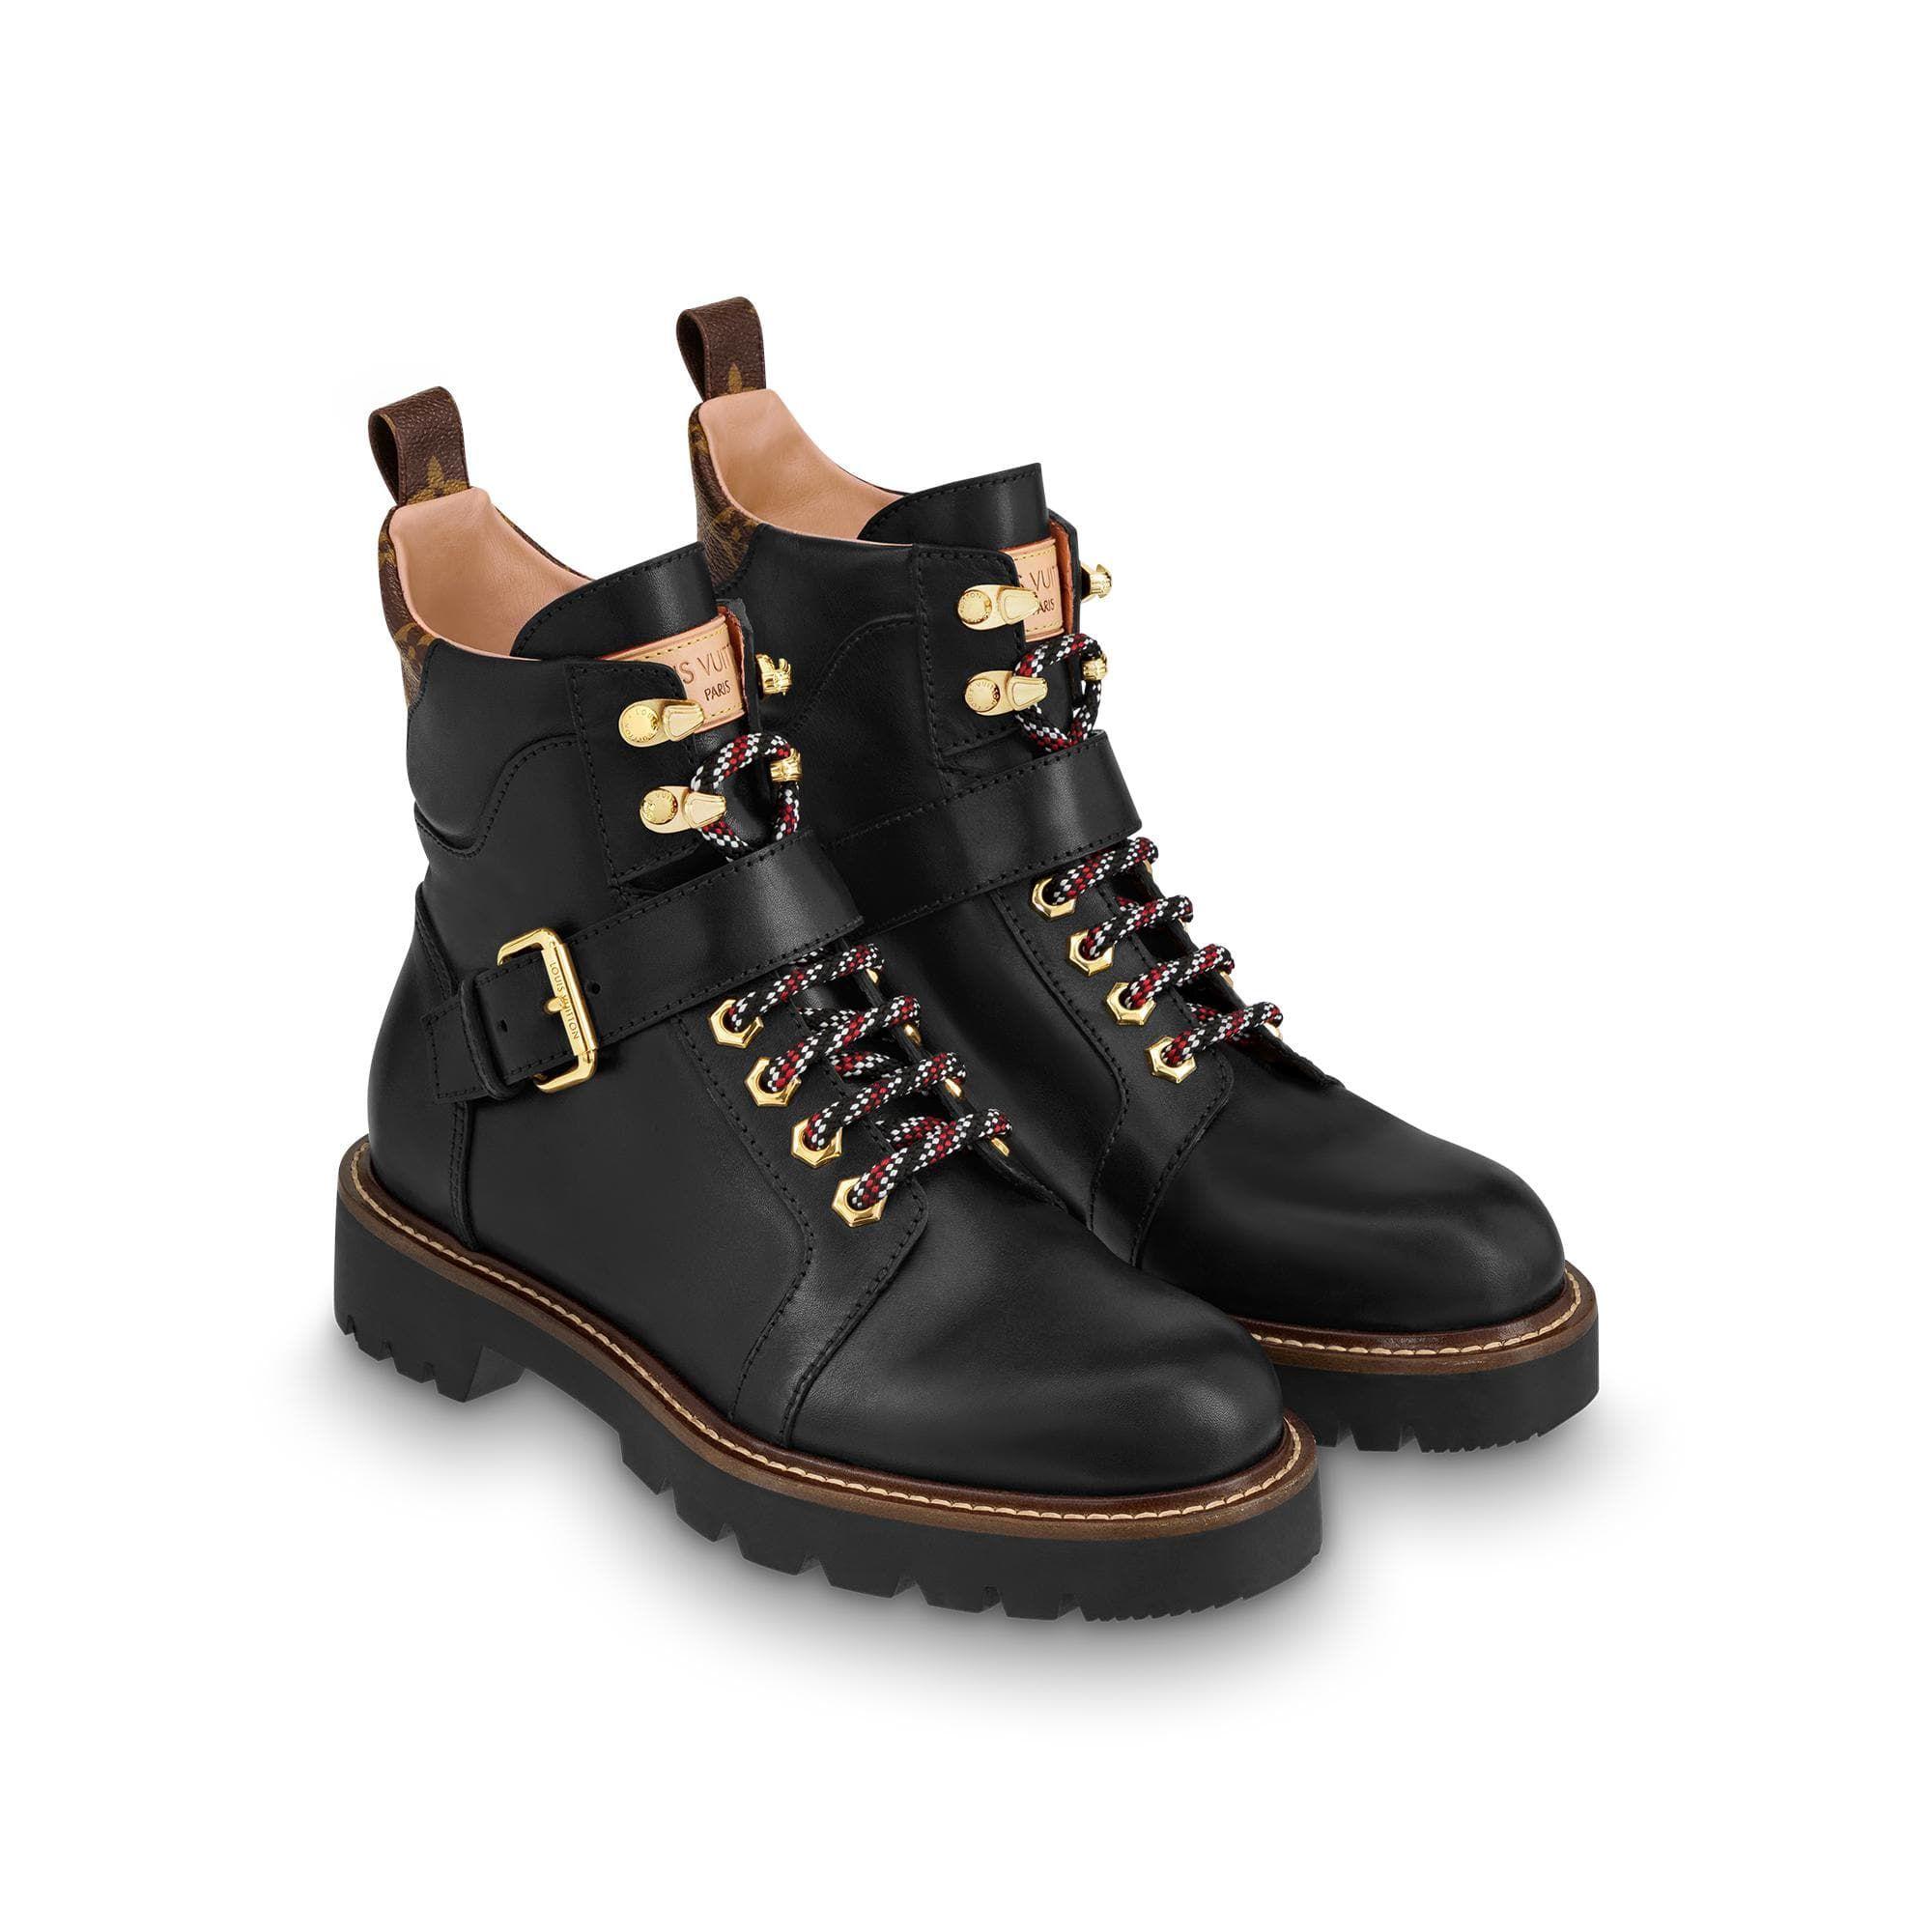 timberland boots official website